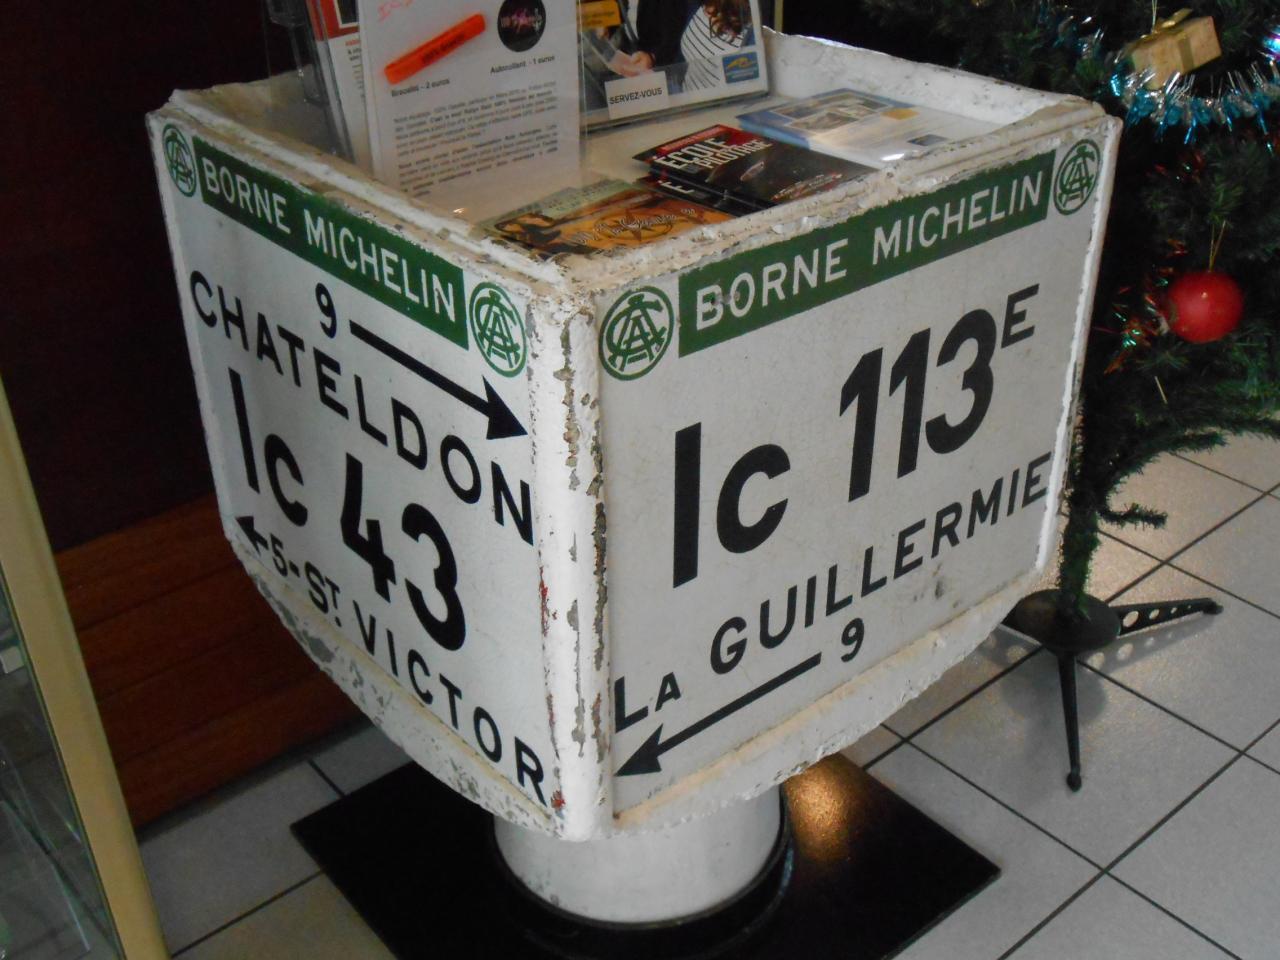 63000 Borne Automobile Club d'Auvergne (1)